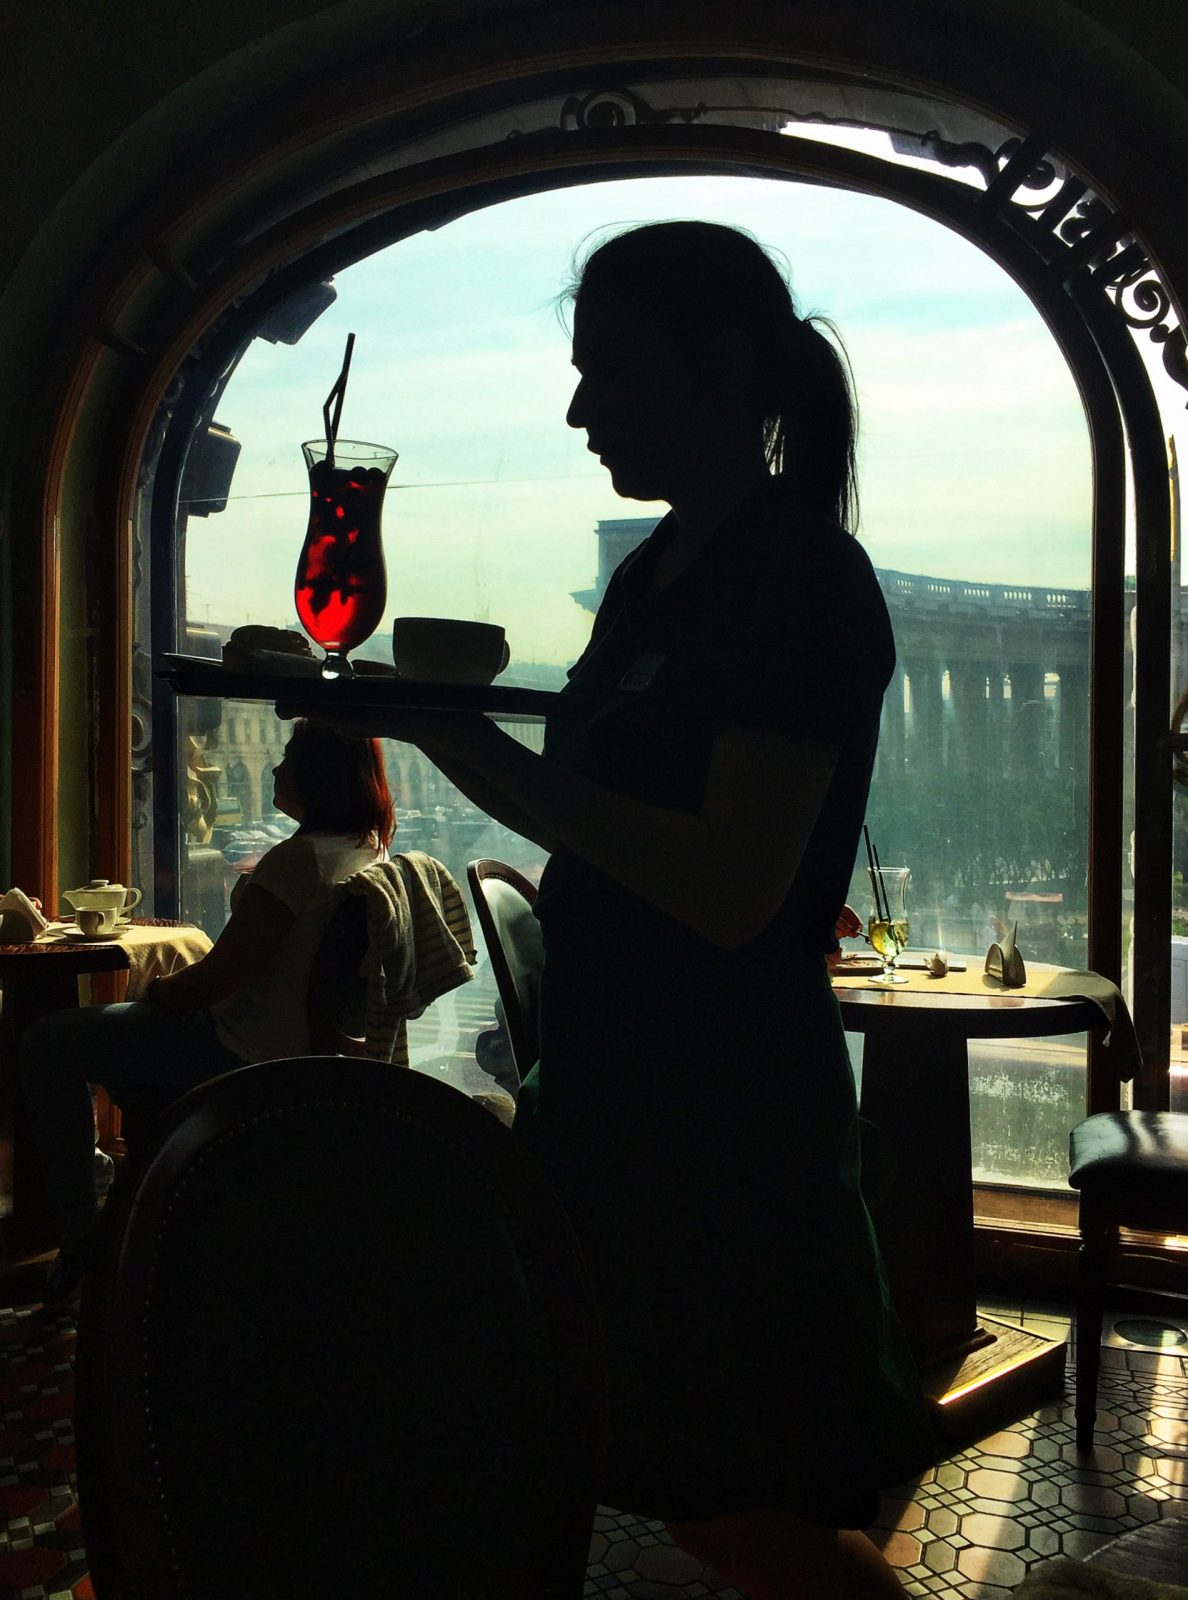 a waitress in a European cafe